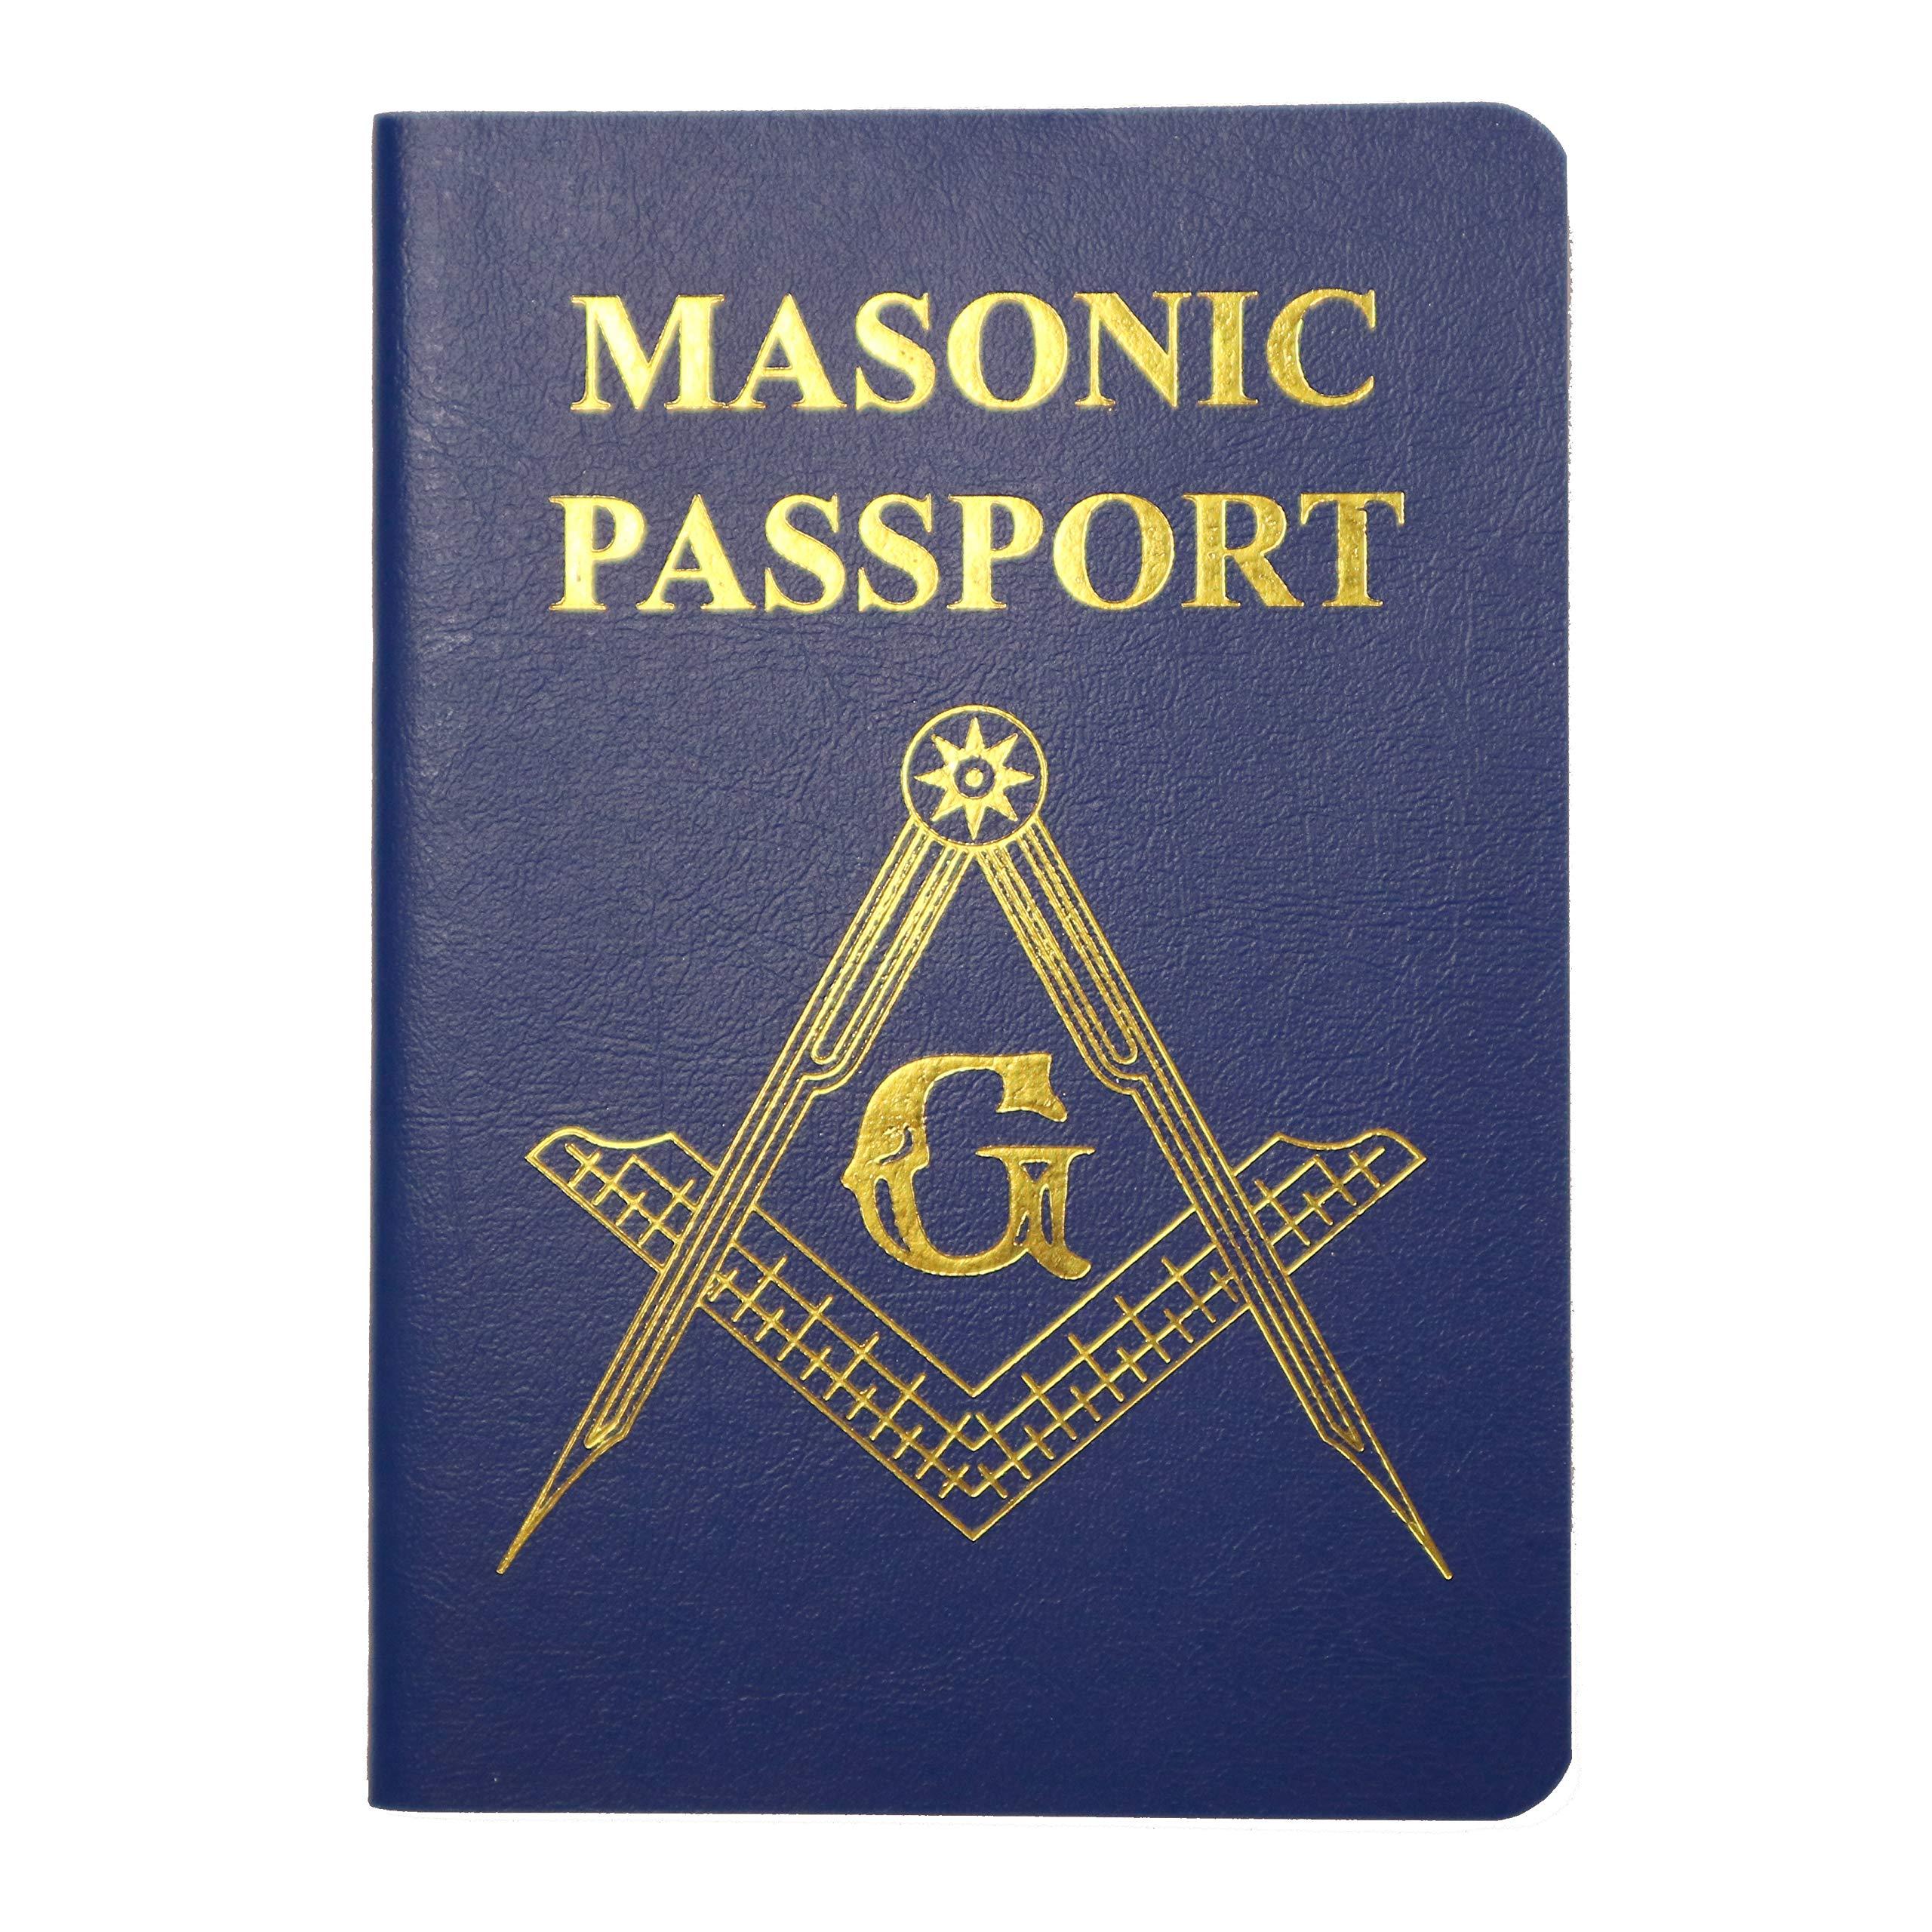 MasonicMan Masonic Passport For Recording Visits to New Freemasonry Lodge (2 Pack) by MasonicMan